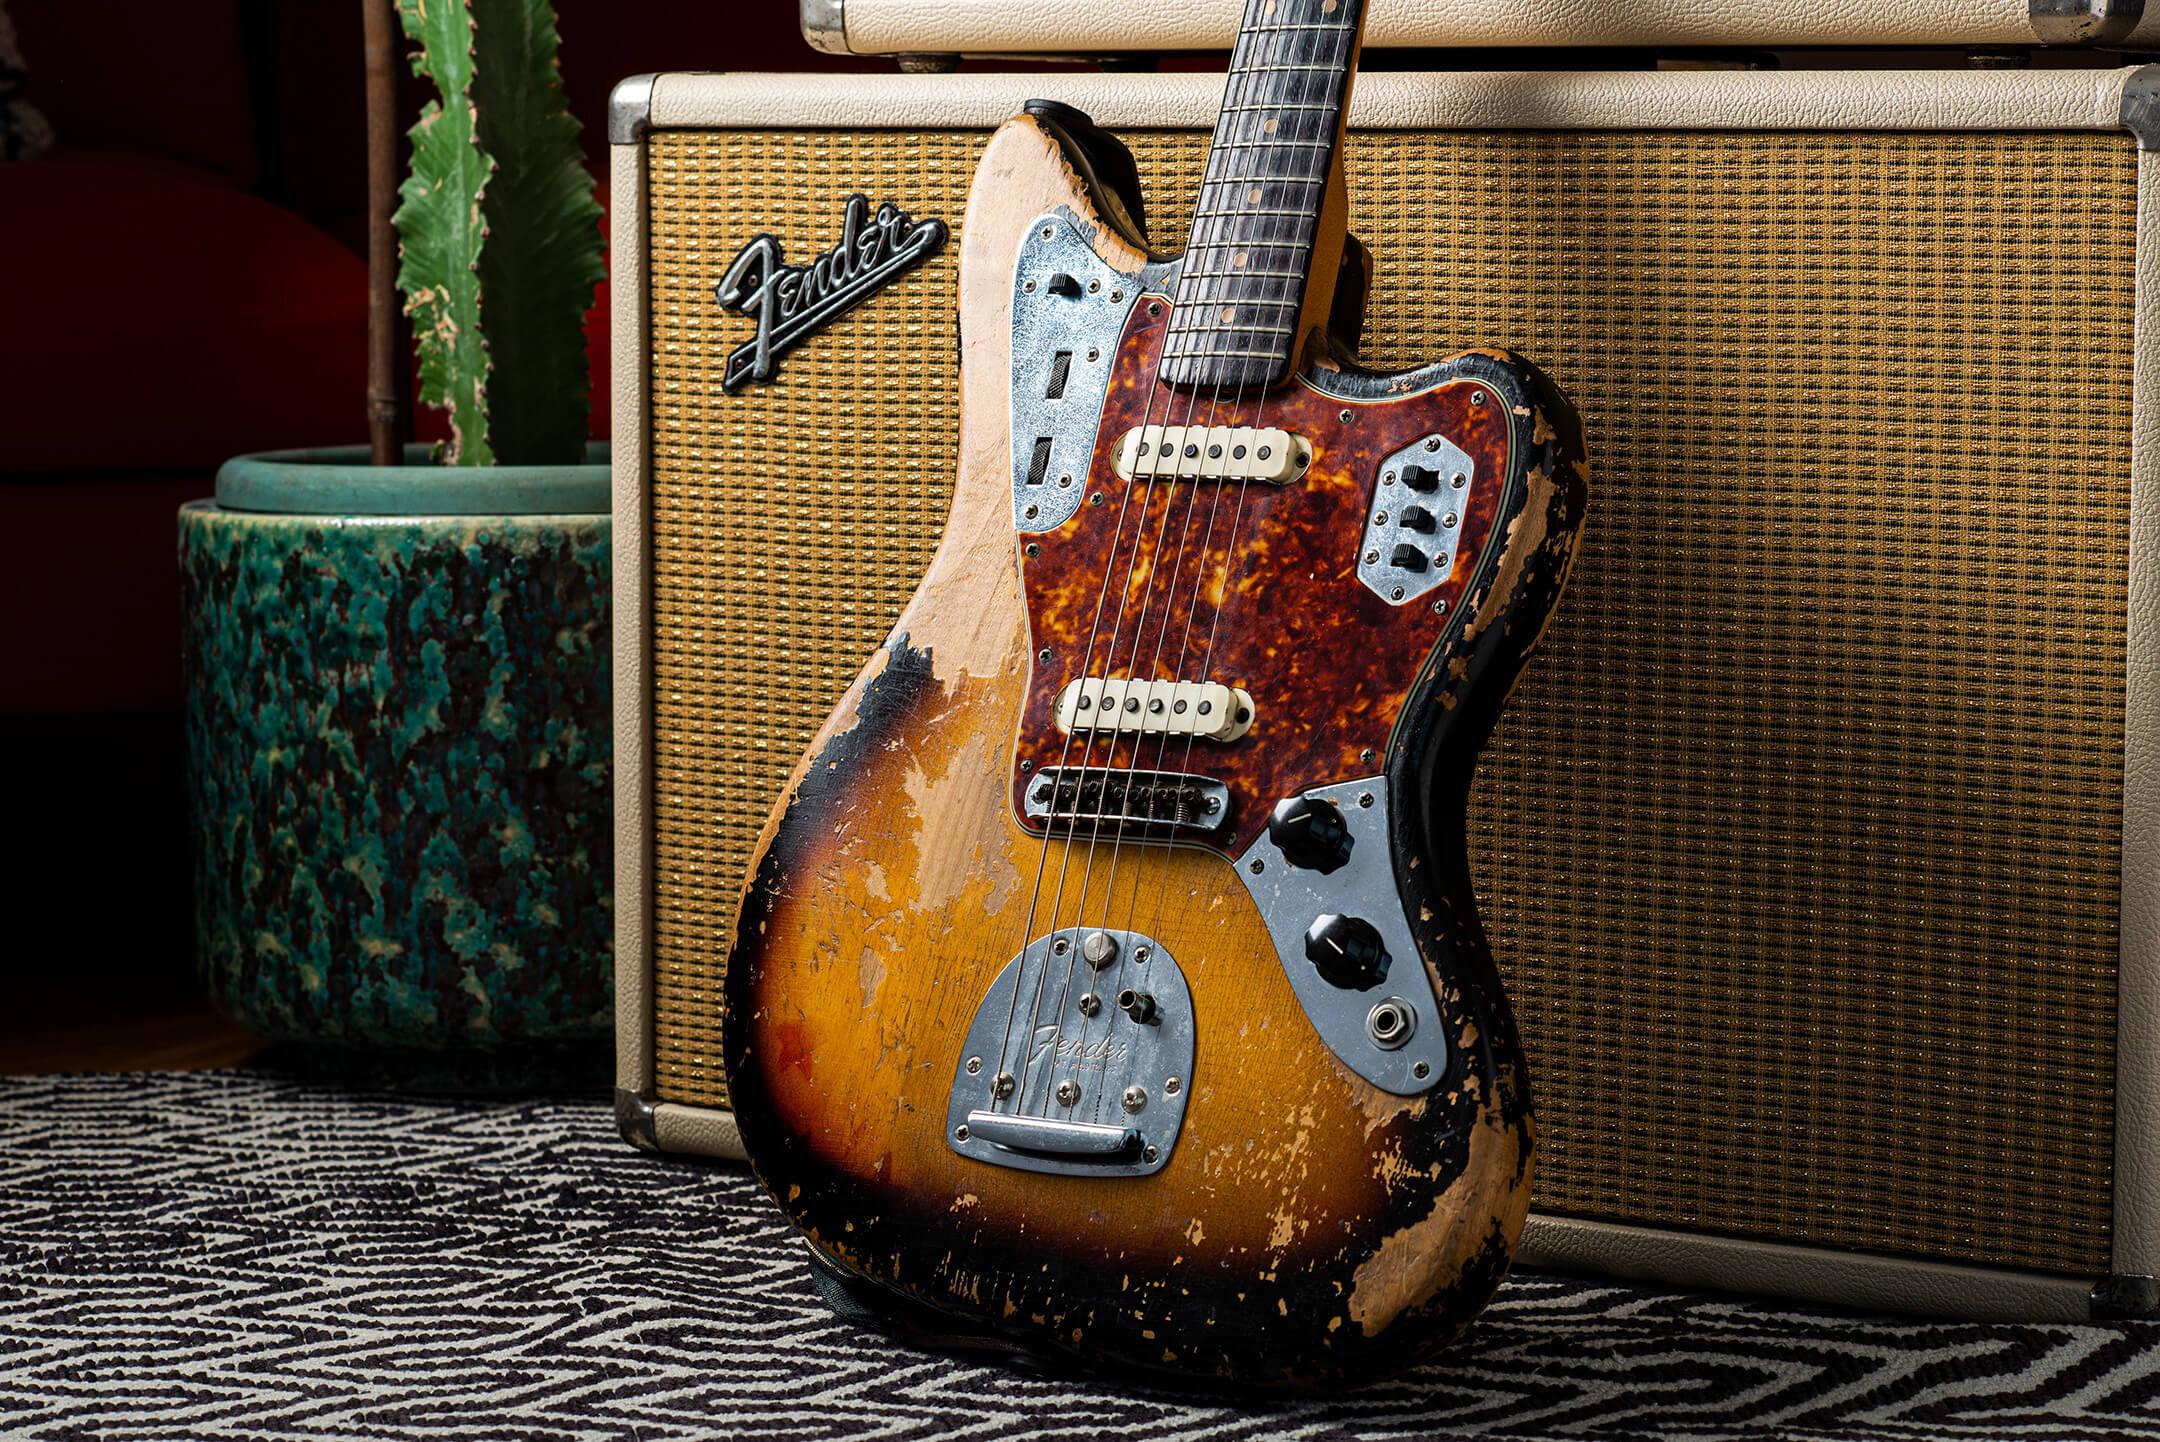 Marc Ransley's 1964 Fender Jaguar